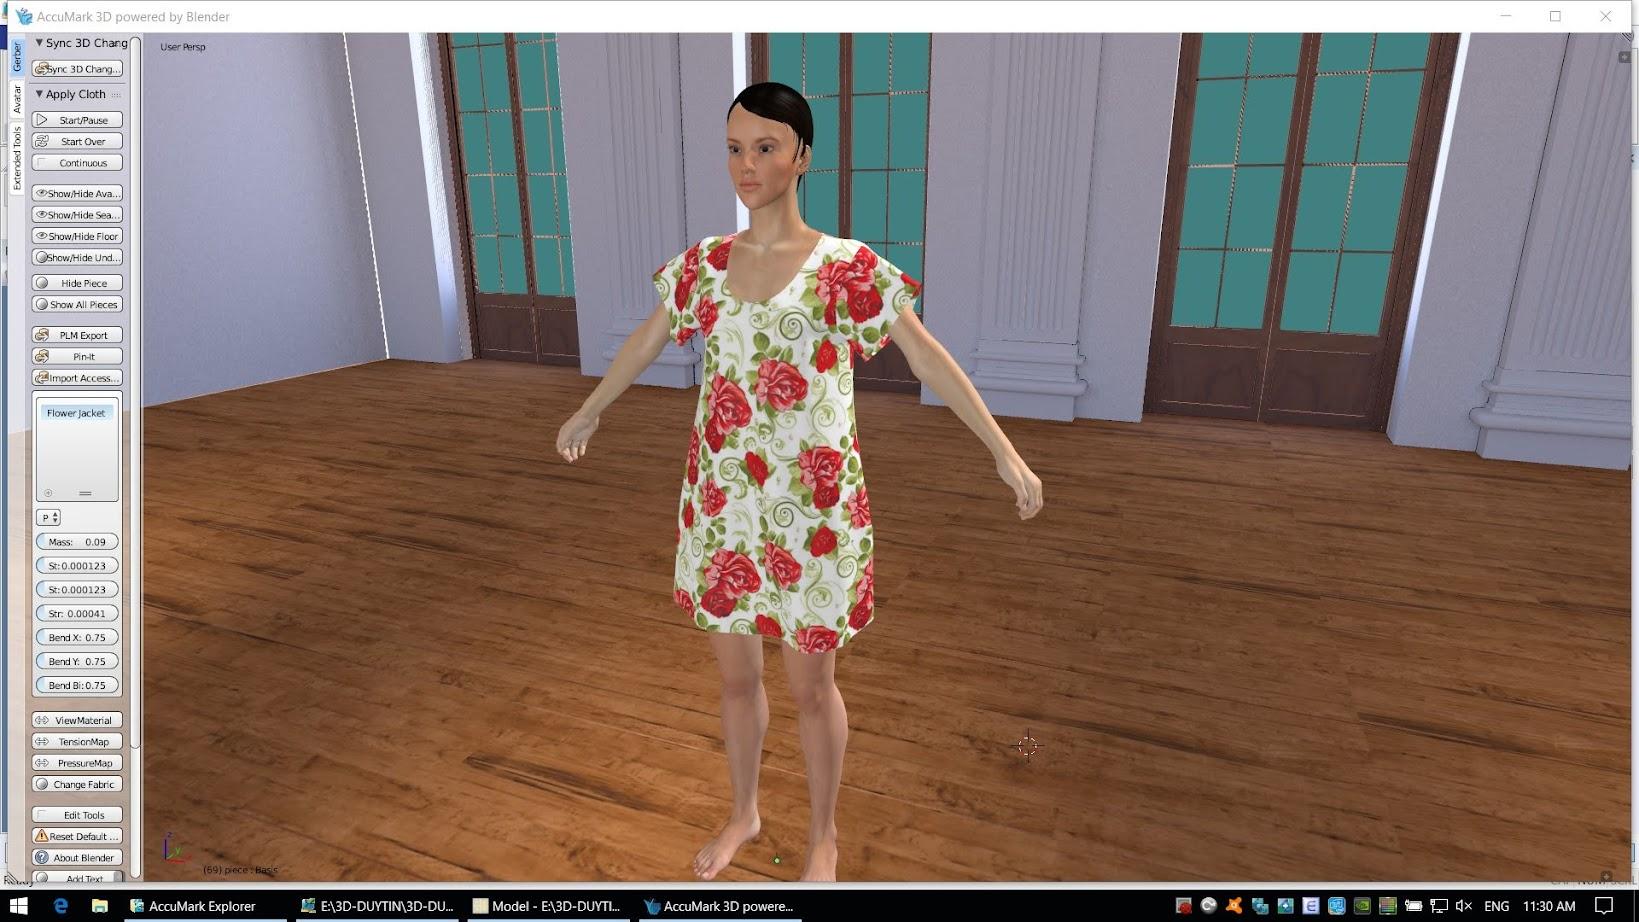 Gerber Accumark 3D-Hướng Dẫn Căn Bản Dựng Mẫu 3D 1